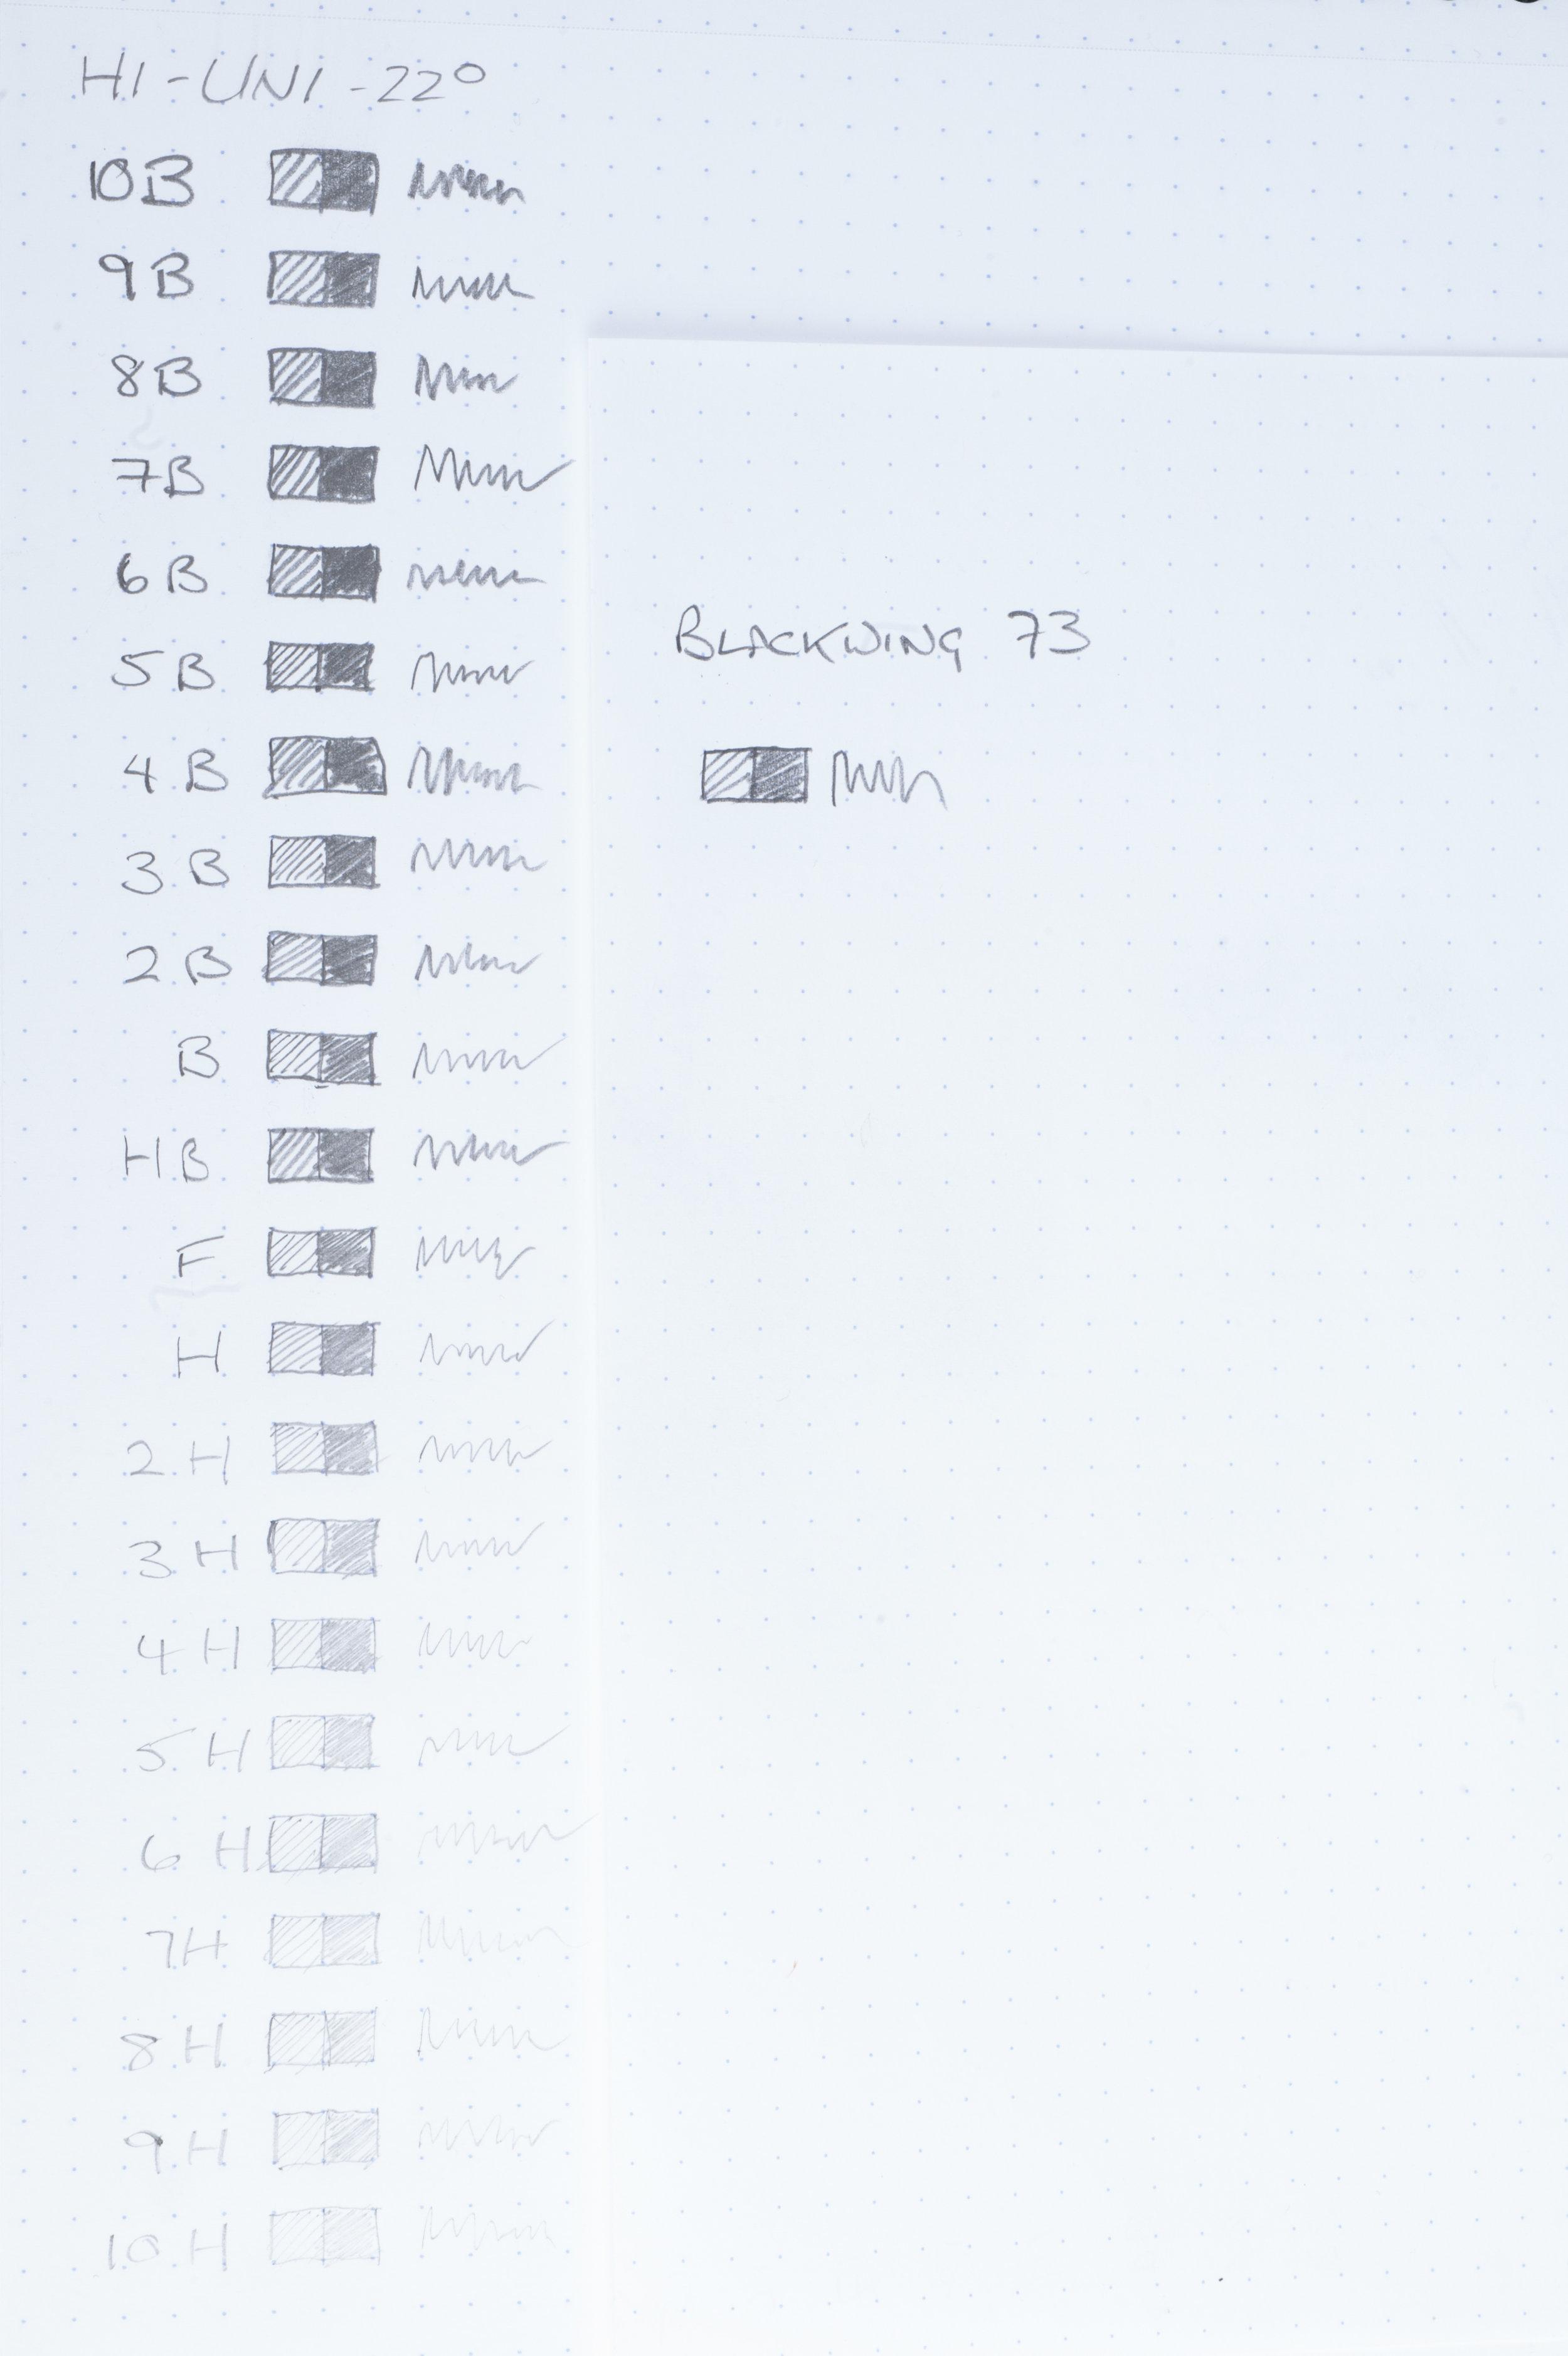 Write Experience - Hi-Uni Blackwing 73 comparison